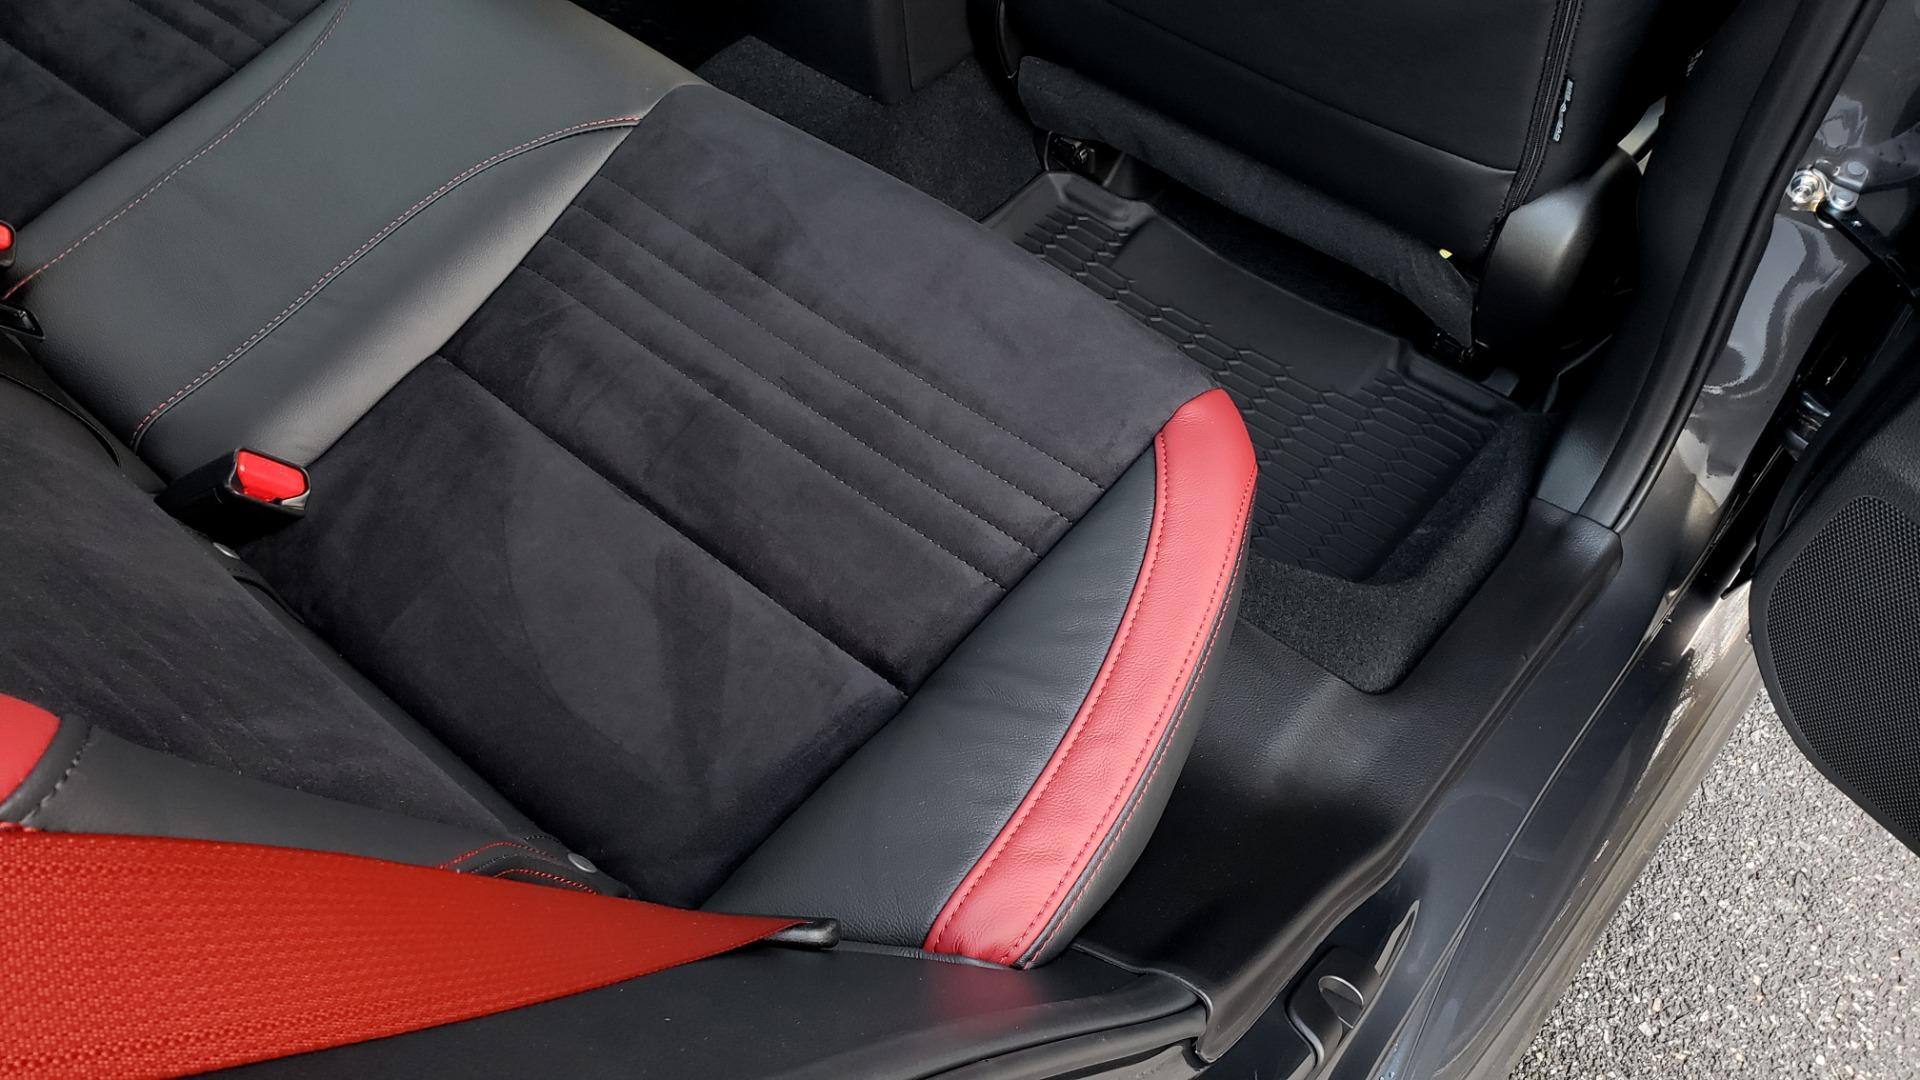 Used 2020 Subaru WRX STI 2.5L TURBO / 6-SPEED MANUAL / RECARO SEATS / REARVIEW for sale Sold at Formula Imports in Charlotte NC 28227 82